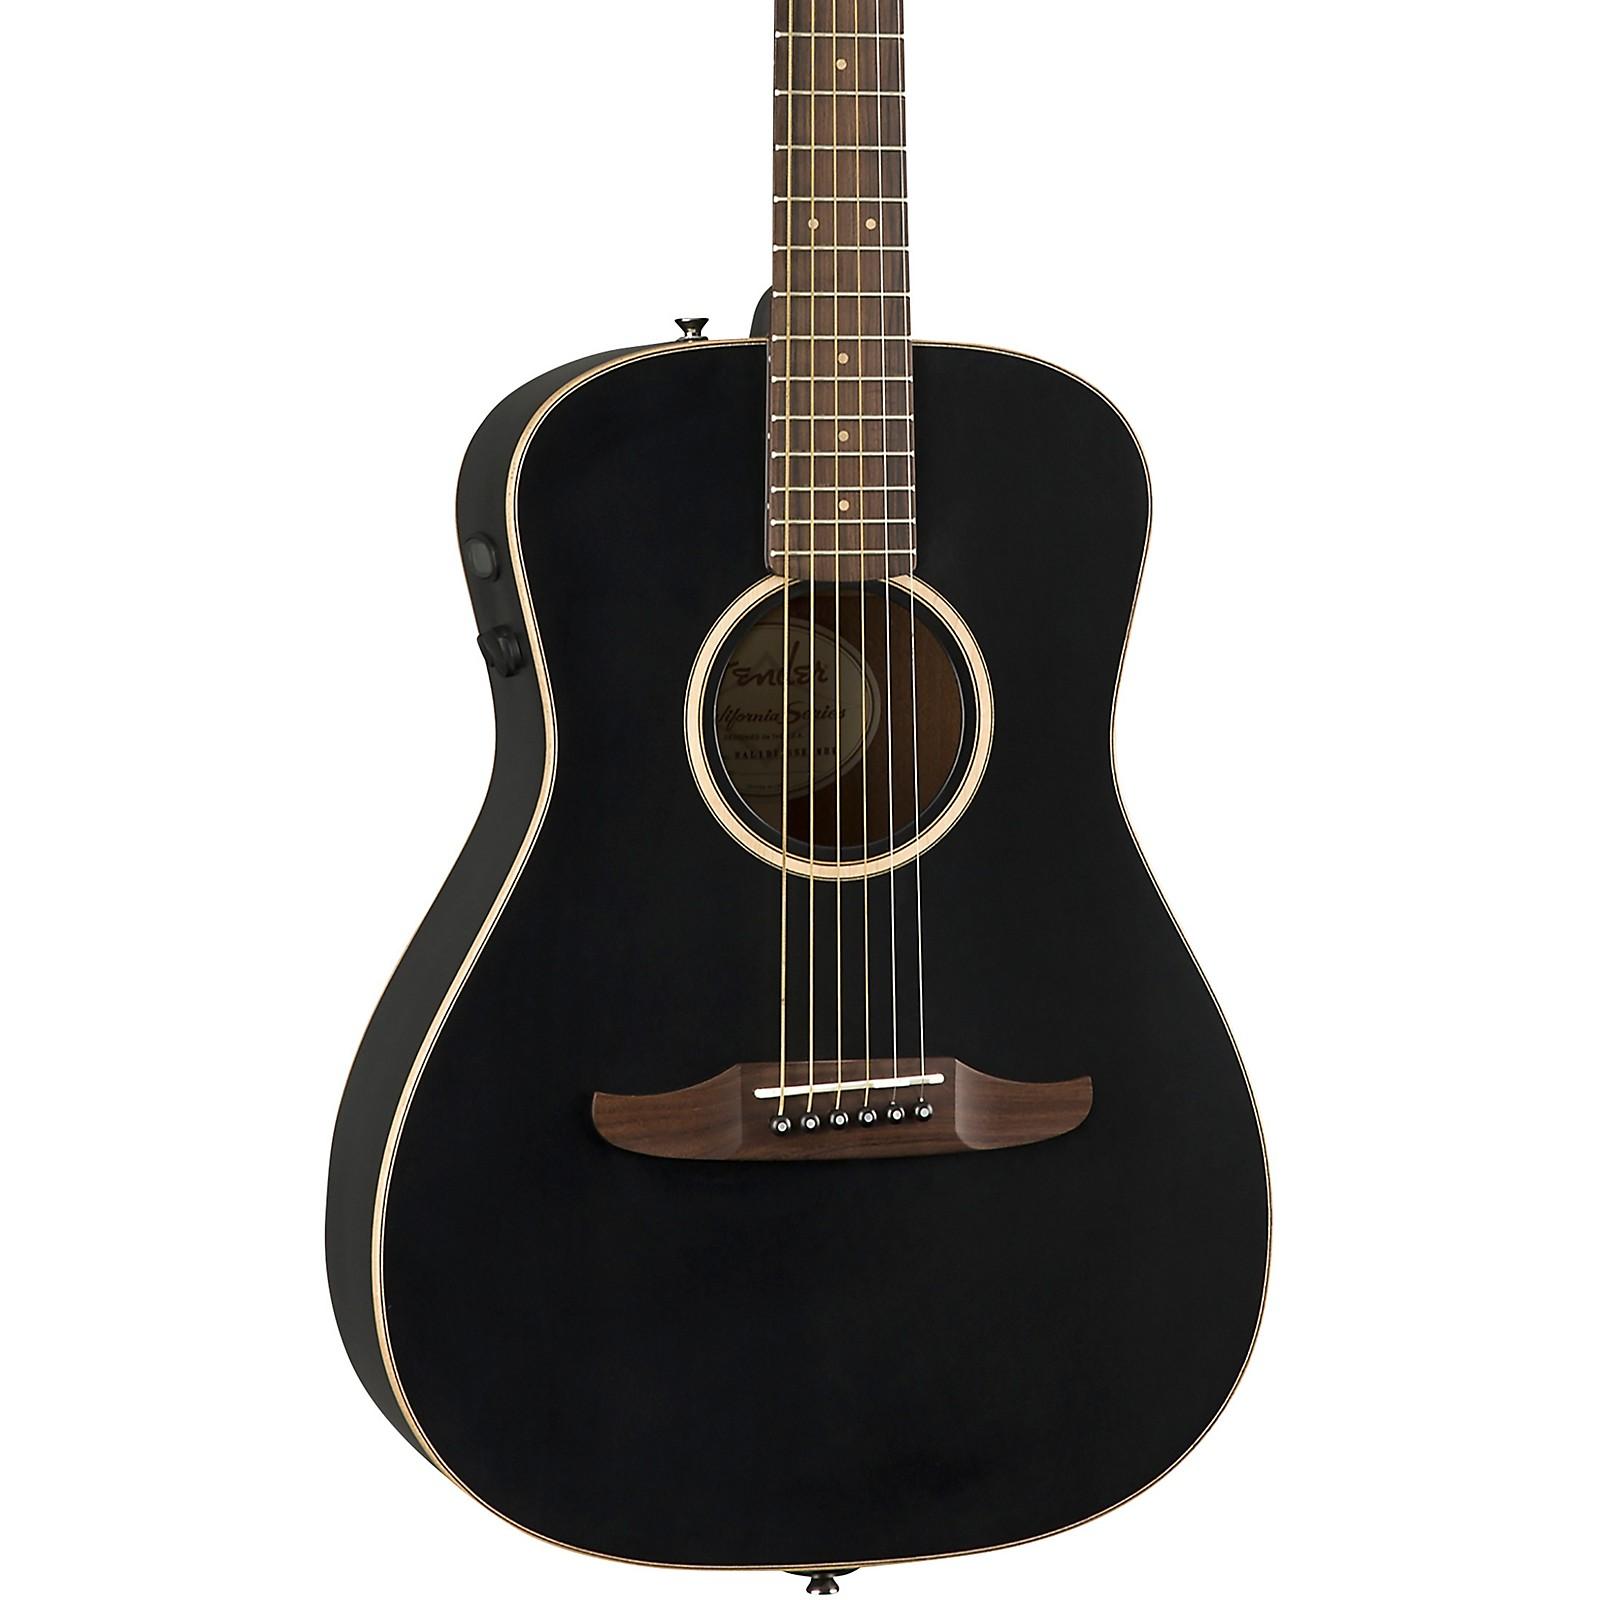 Fender California Malibu Special Acoustic-Electric Guitar